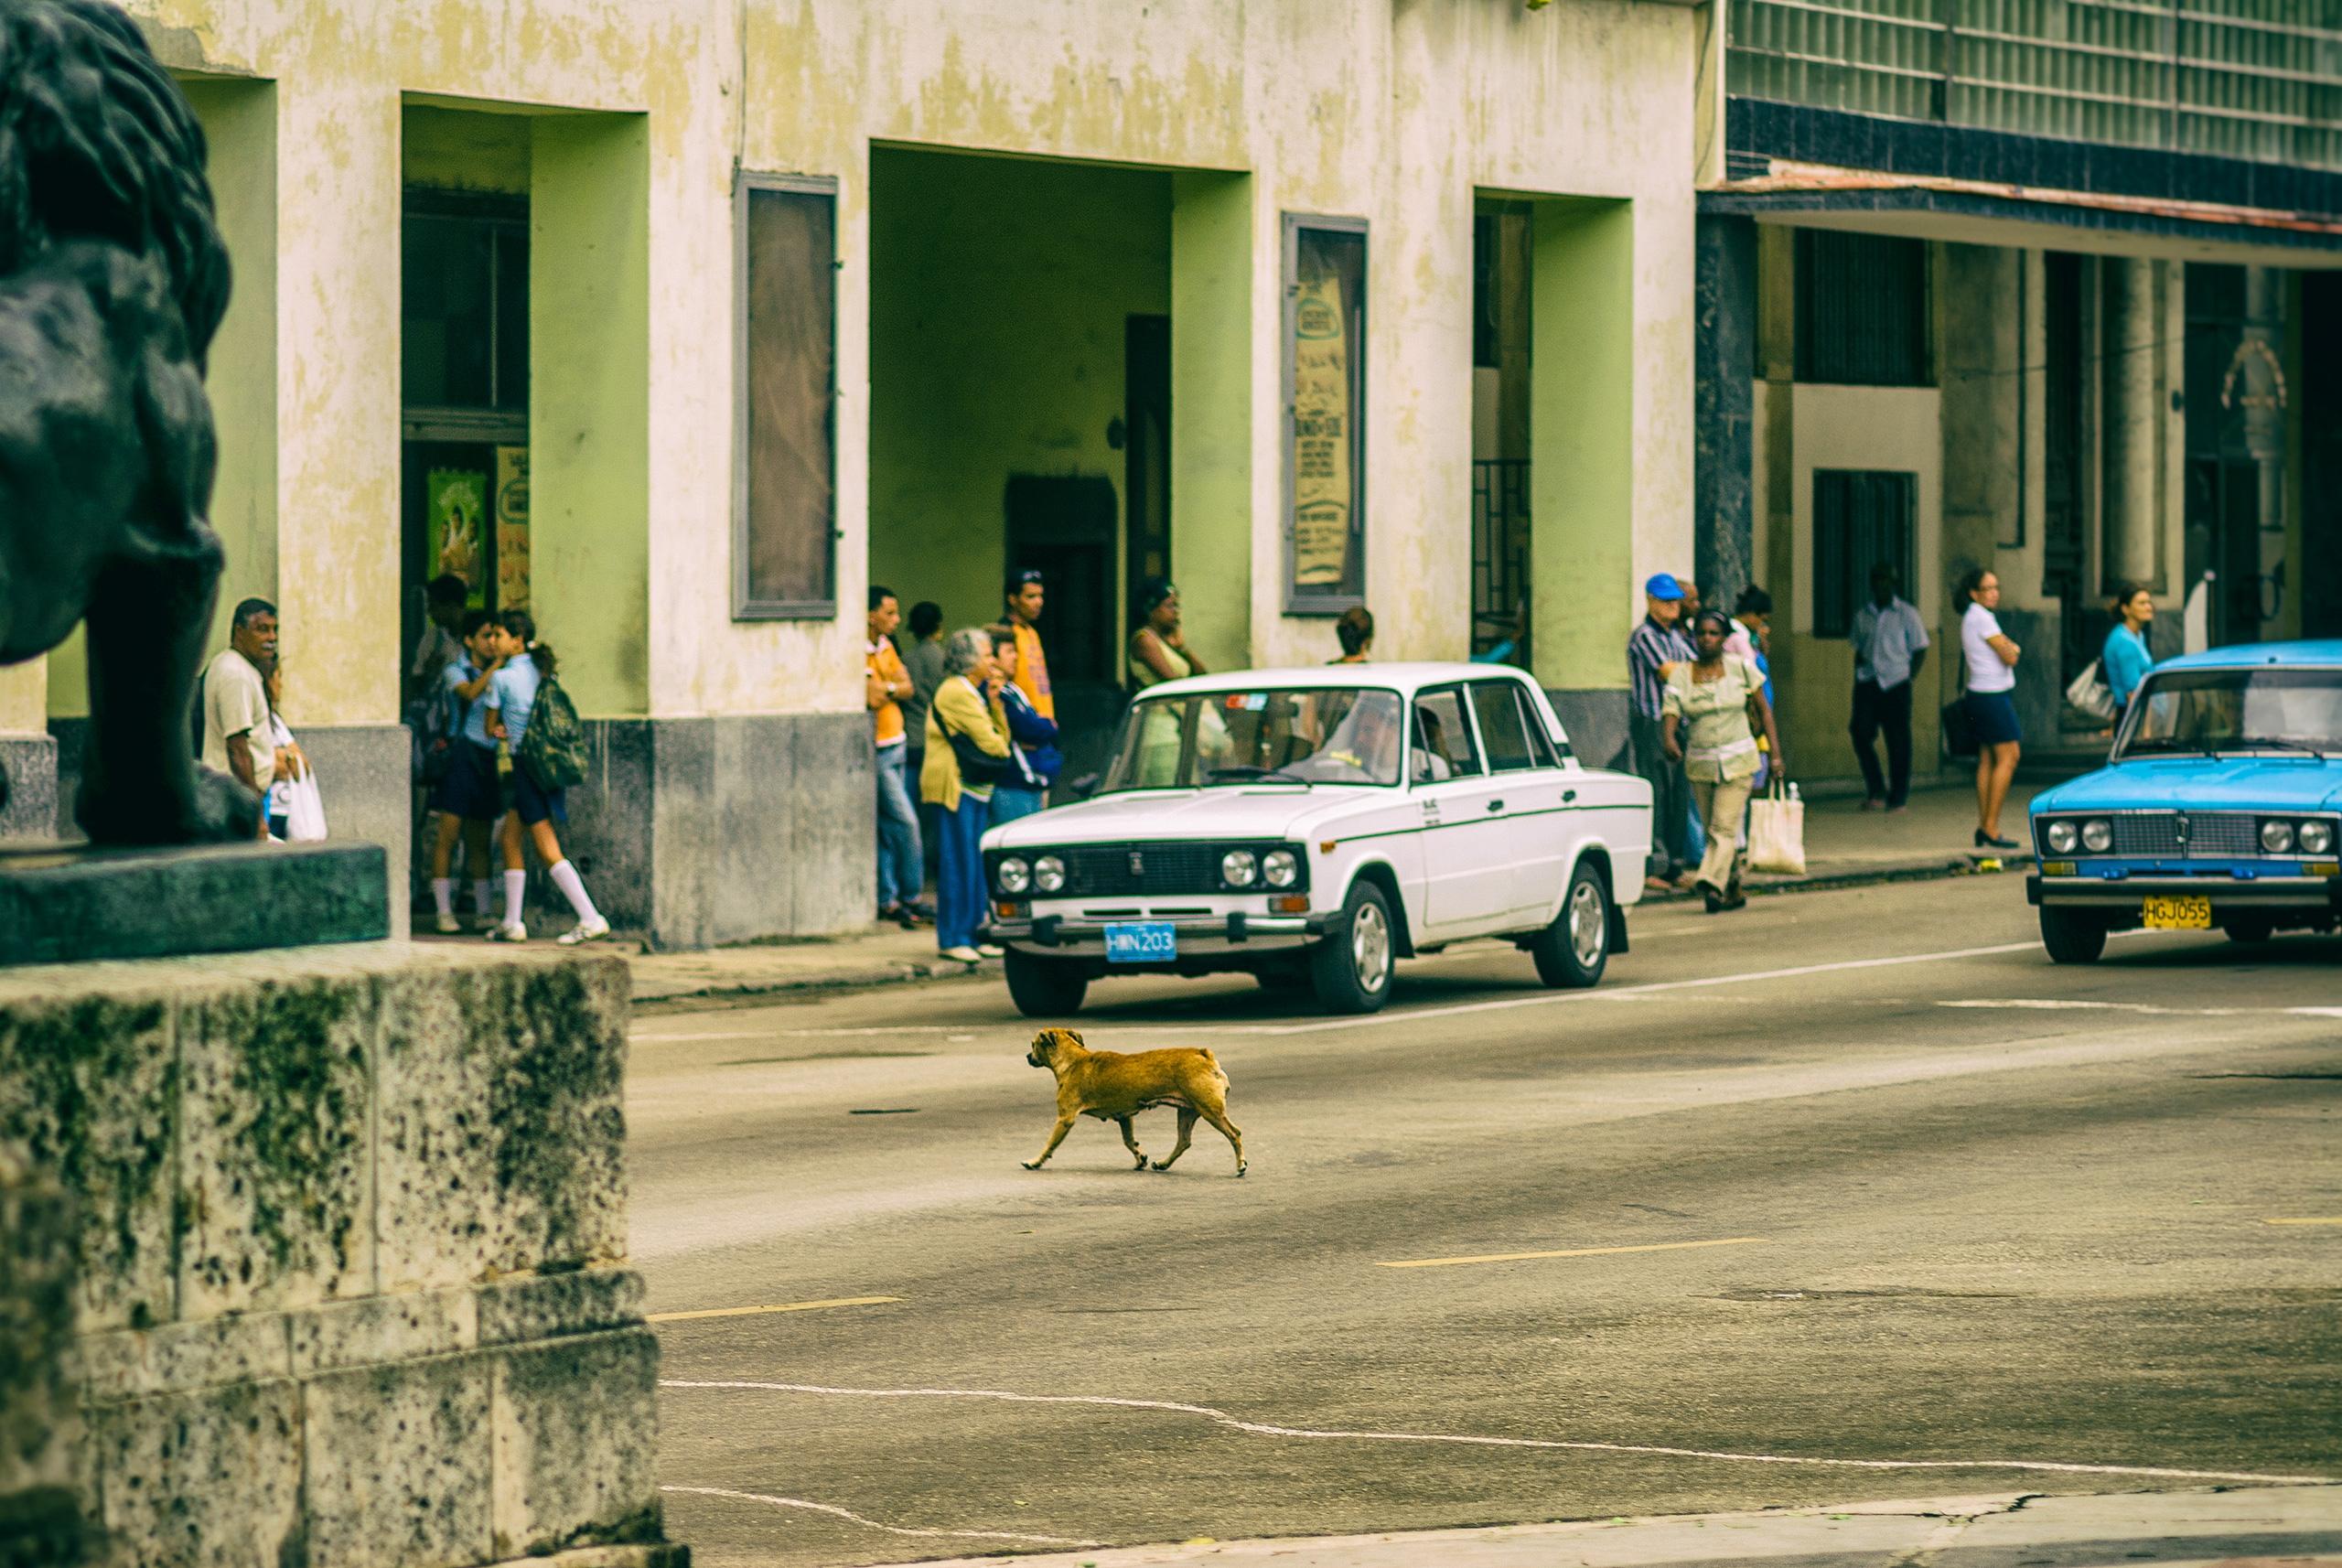 mistress damned, crossing - Habana - christofkessemeier | ello